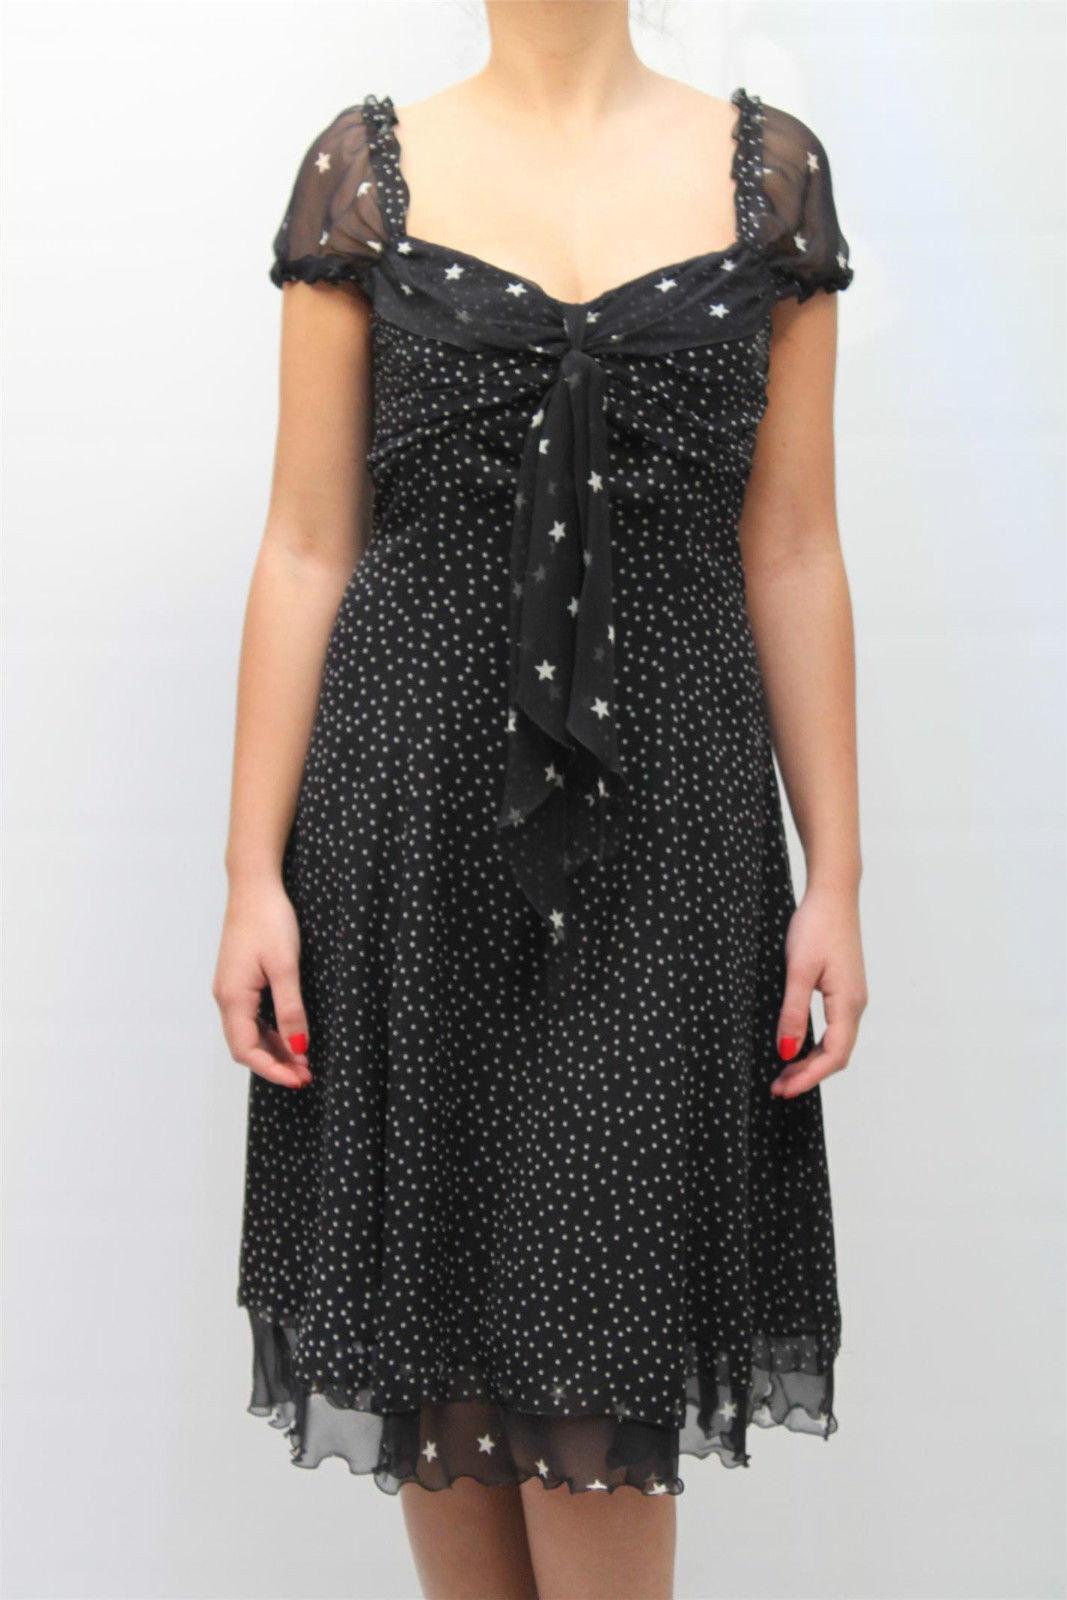 ABITO CLIPS MORE women DRESS ПЛАТЬЕ 100% Seta, B026 2042 black MIS.48 PP 10